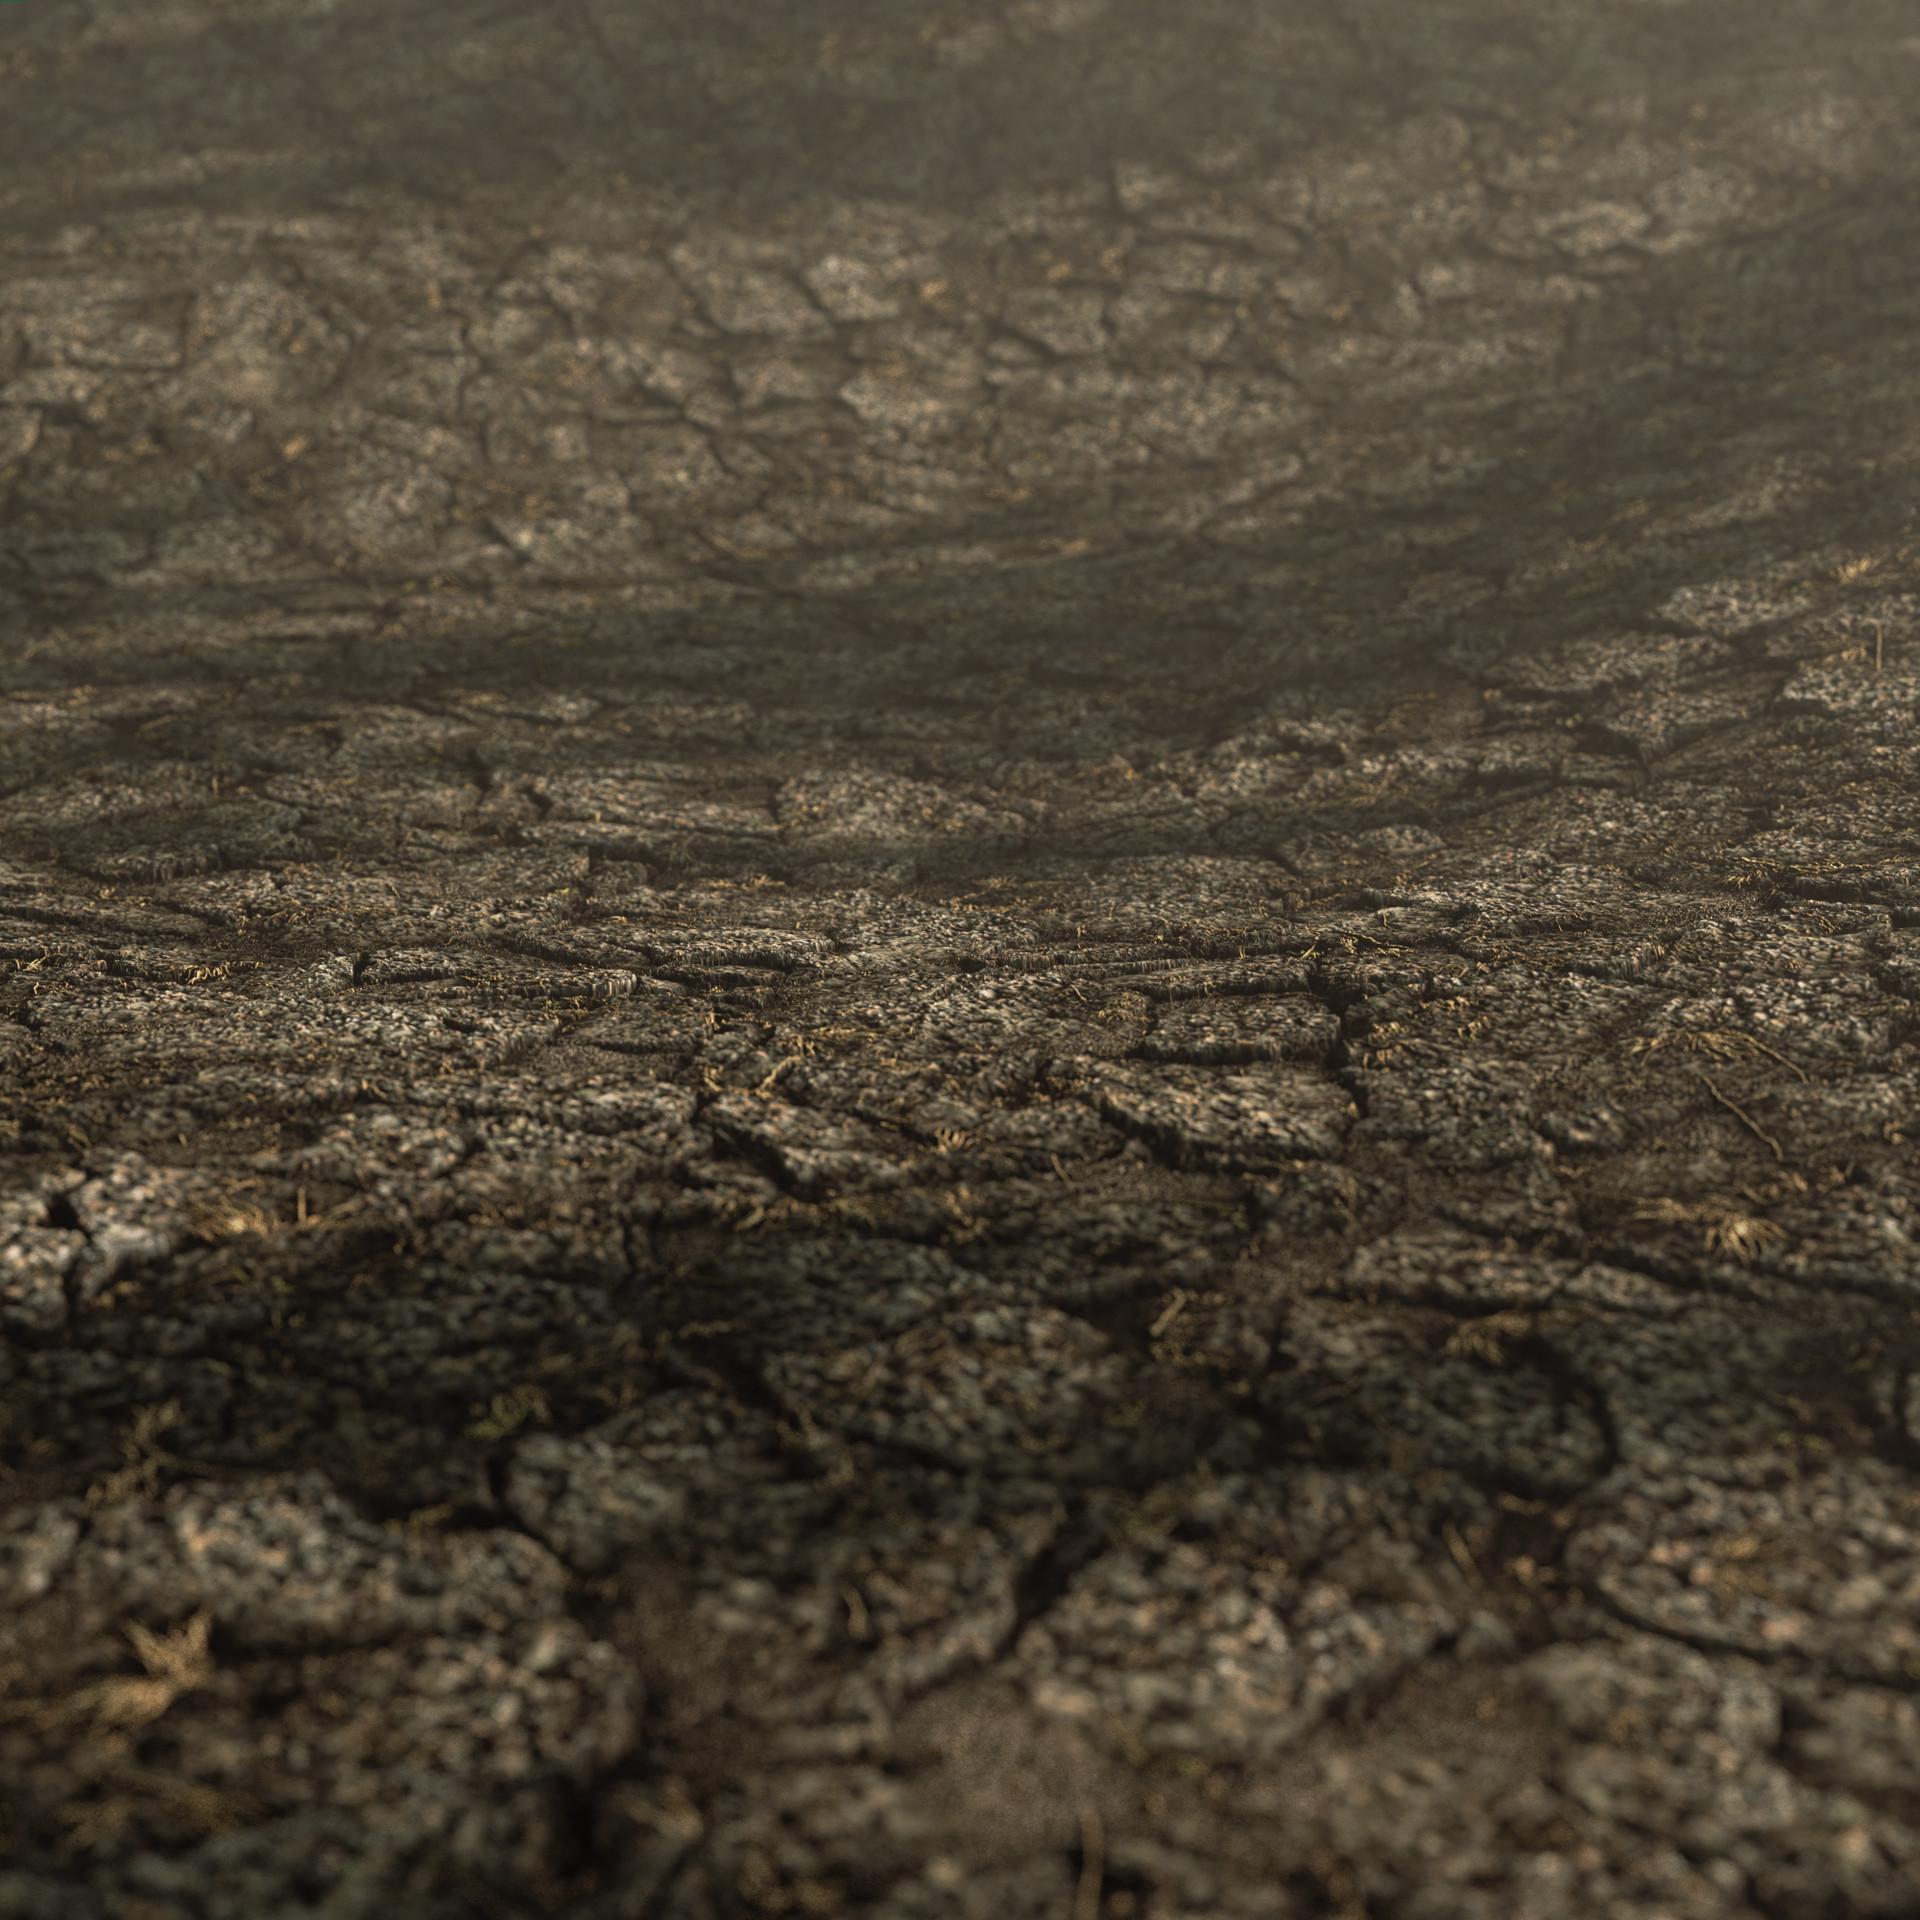 Cem tezcan hard soil ground 00000 beauty